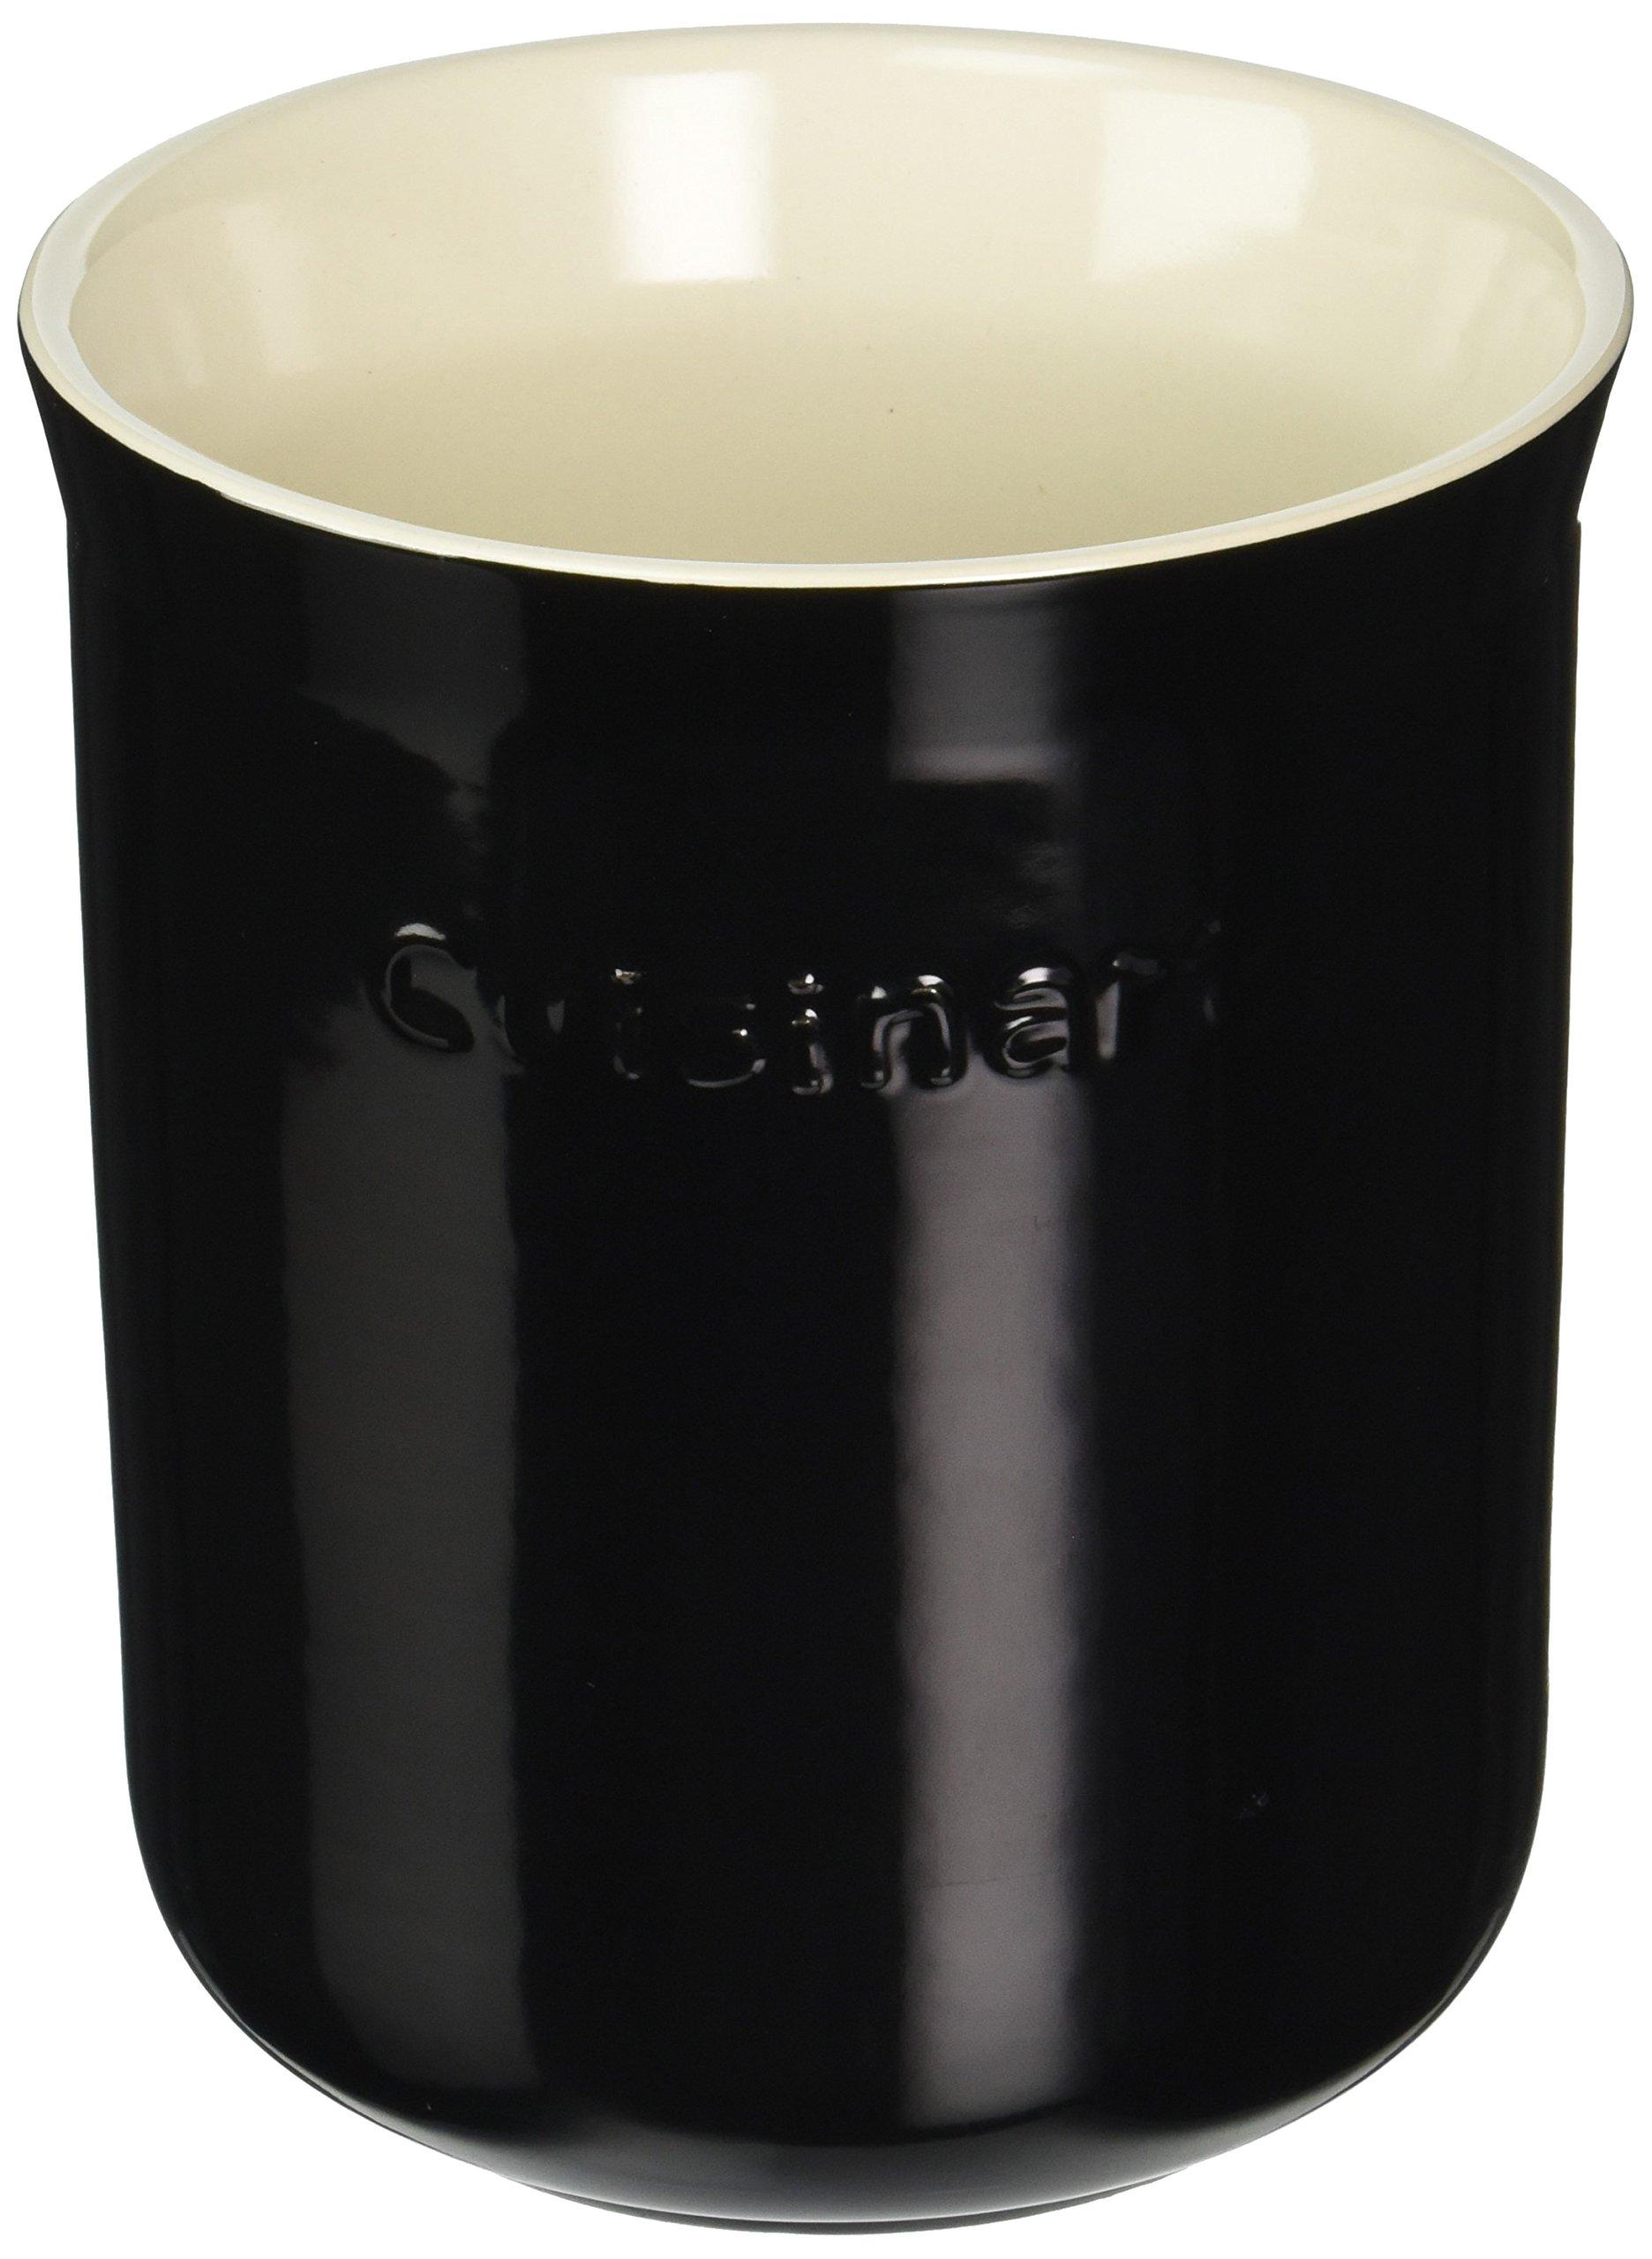 Cuisinart CTG-00-CCRBC Ceramic Crock, Black and Cream by Cuisinart